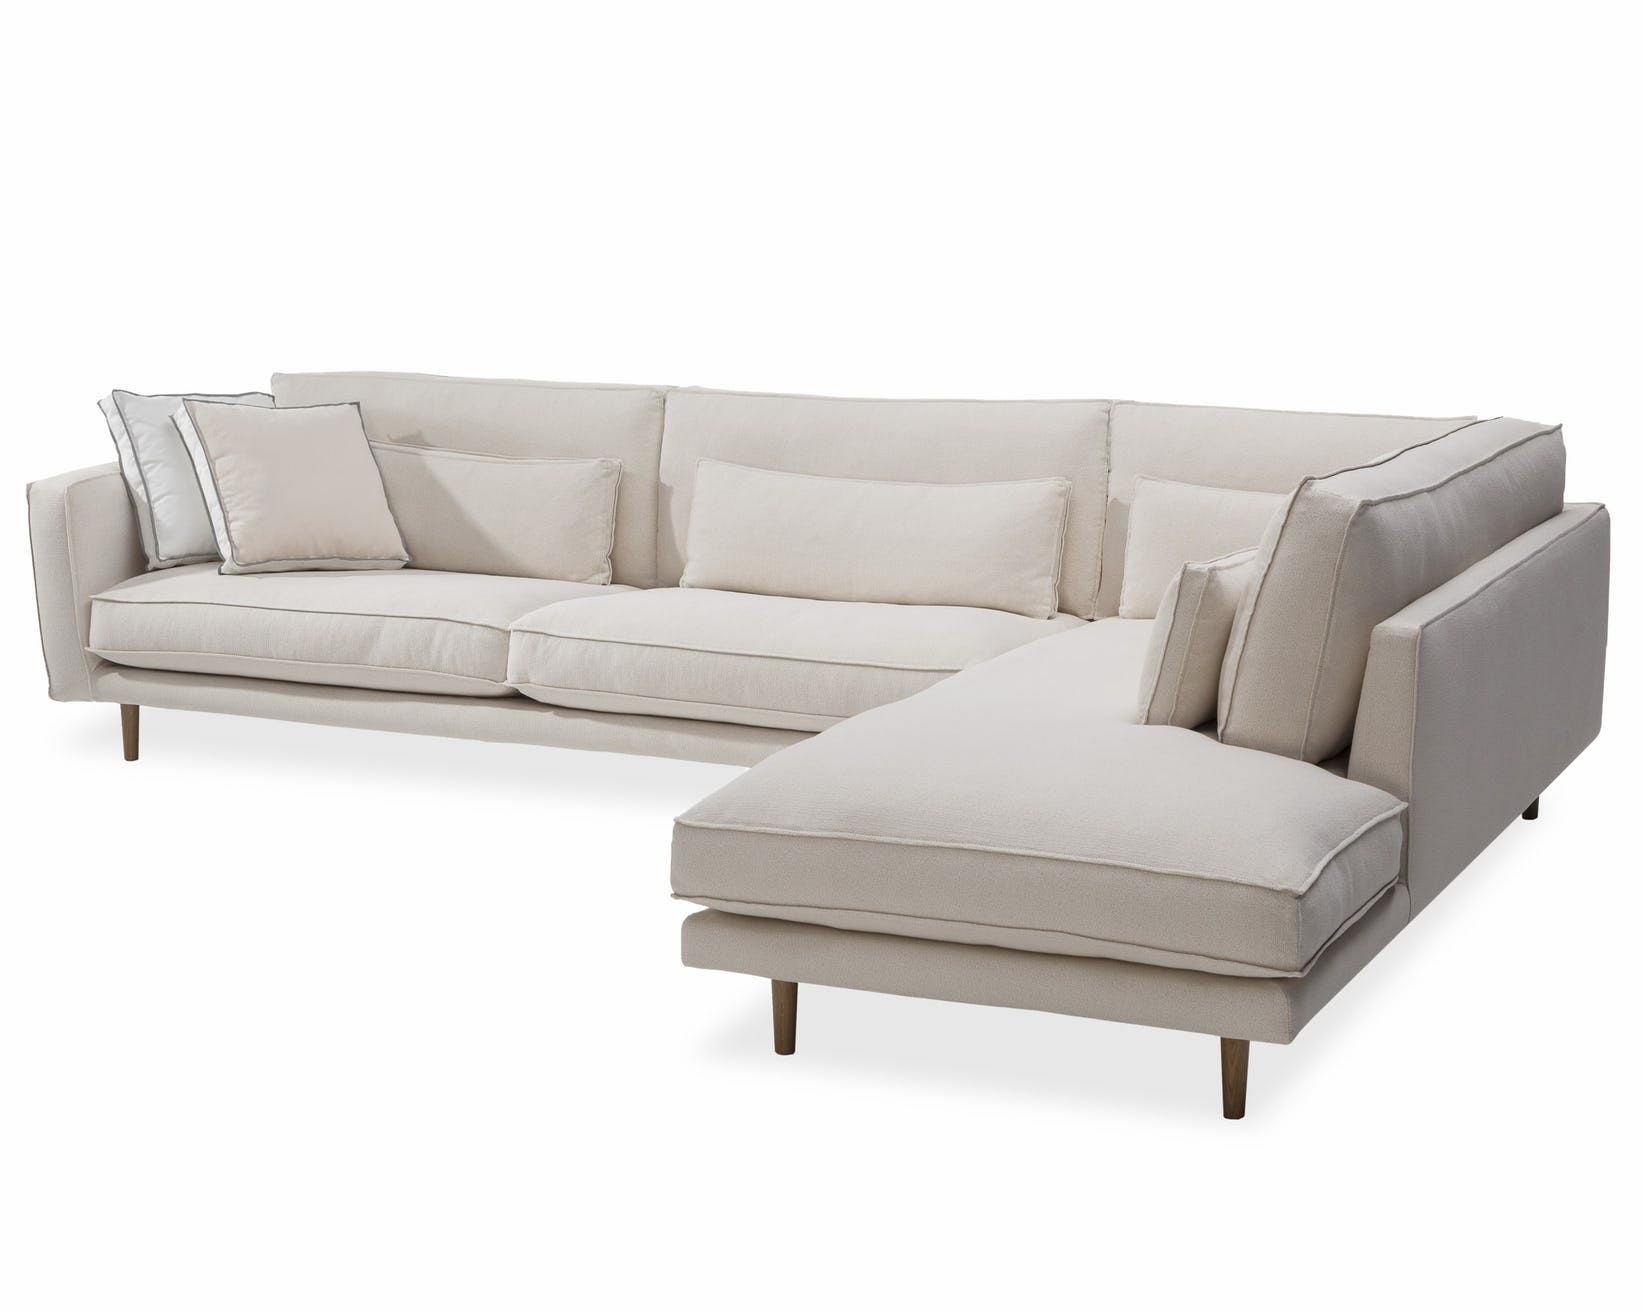 Pleasure Sofa By Linteloo Now Available At Haute Living Sofa